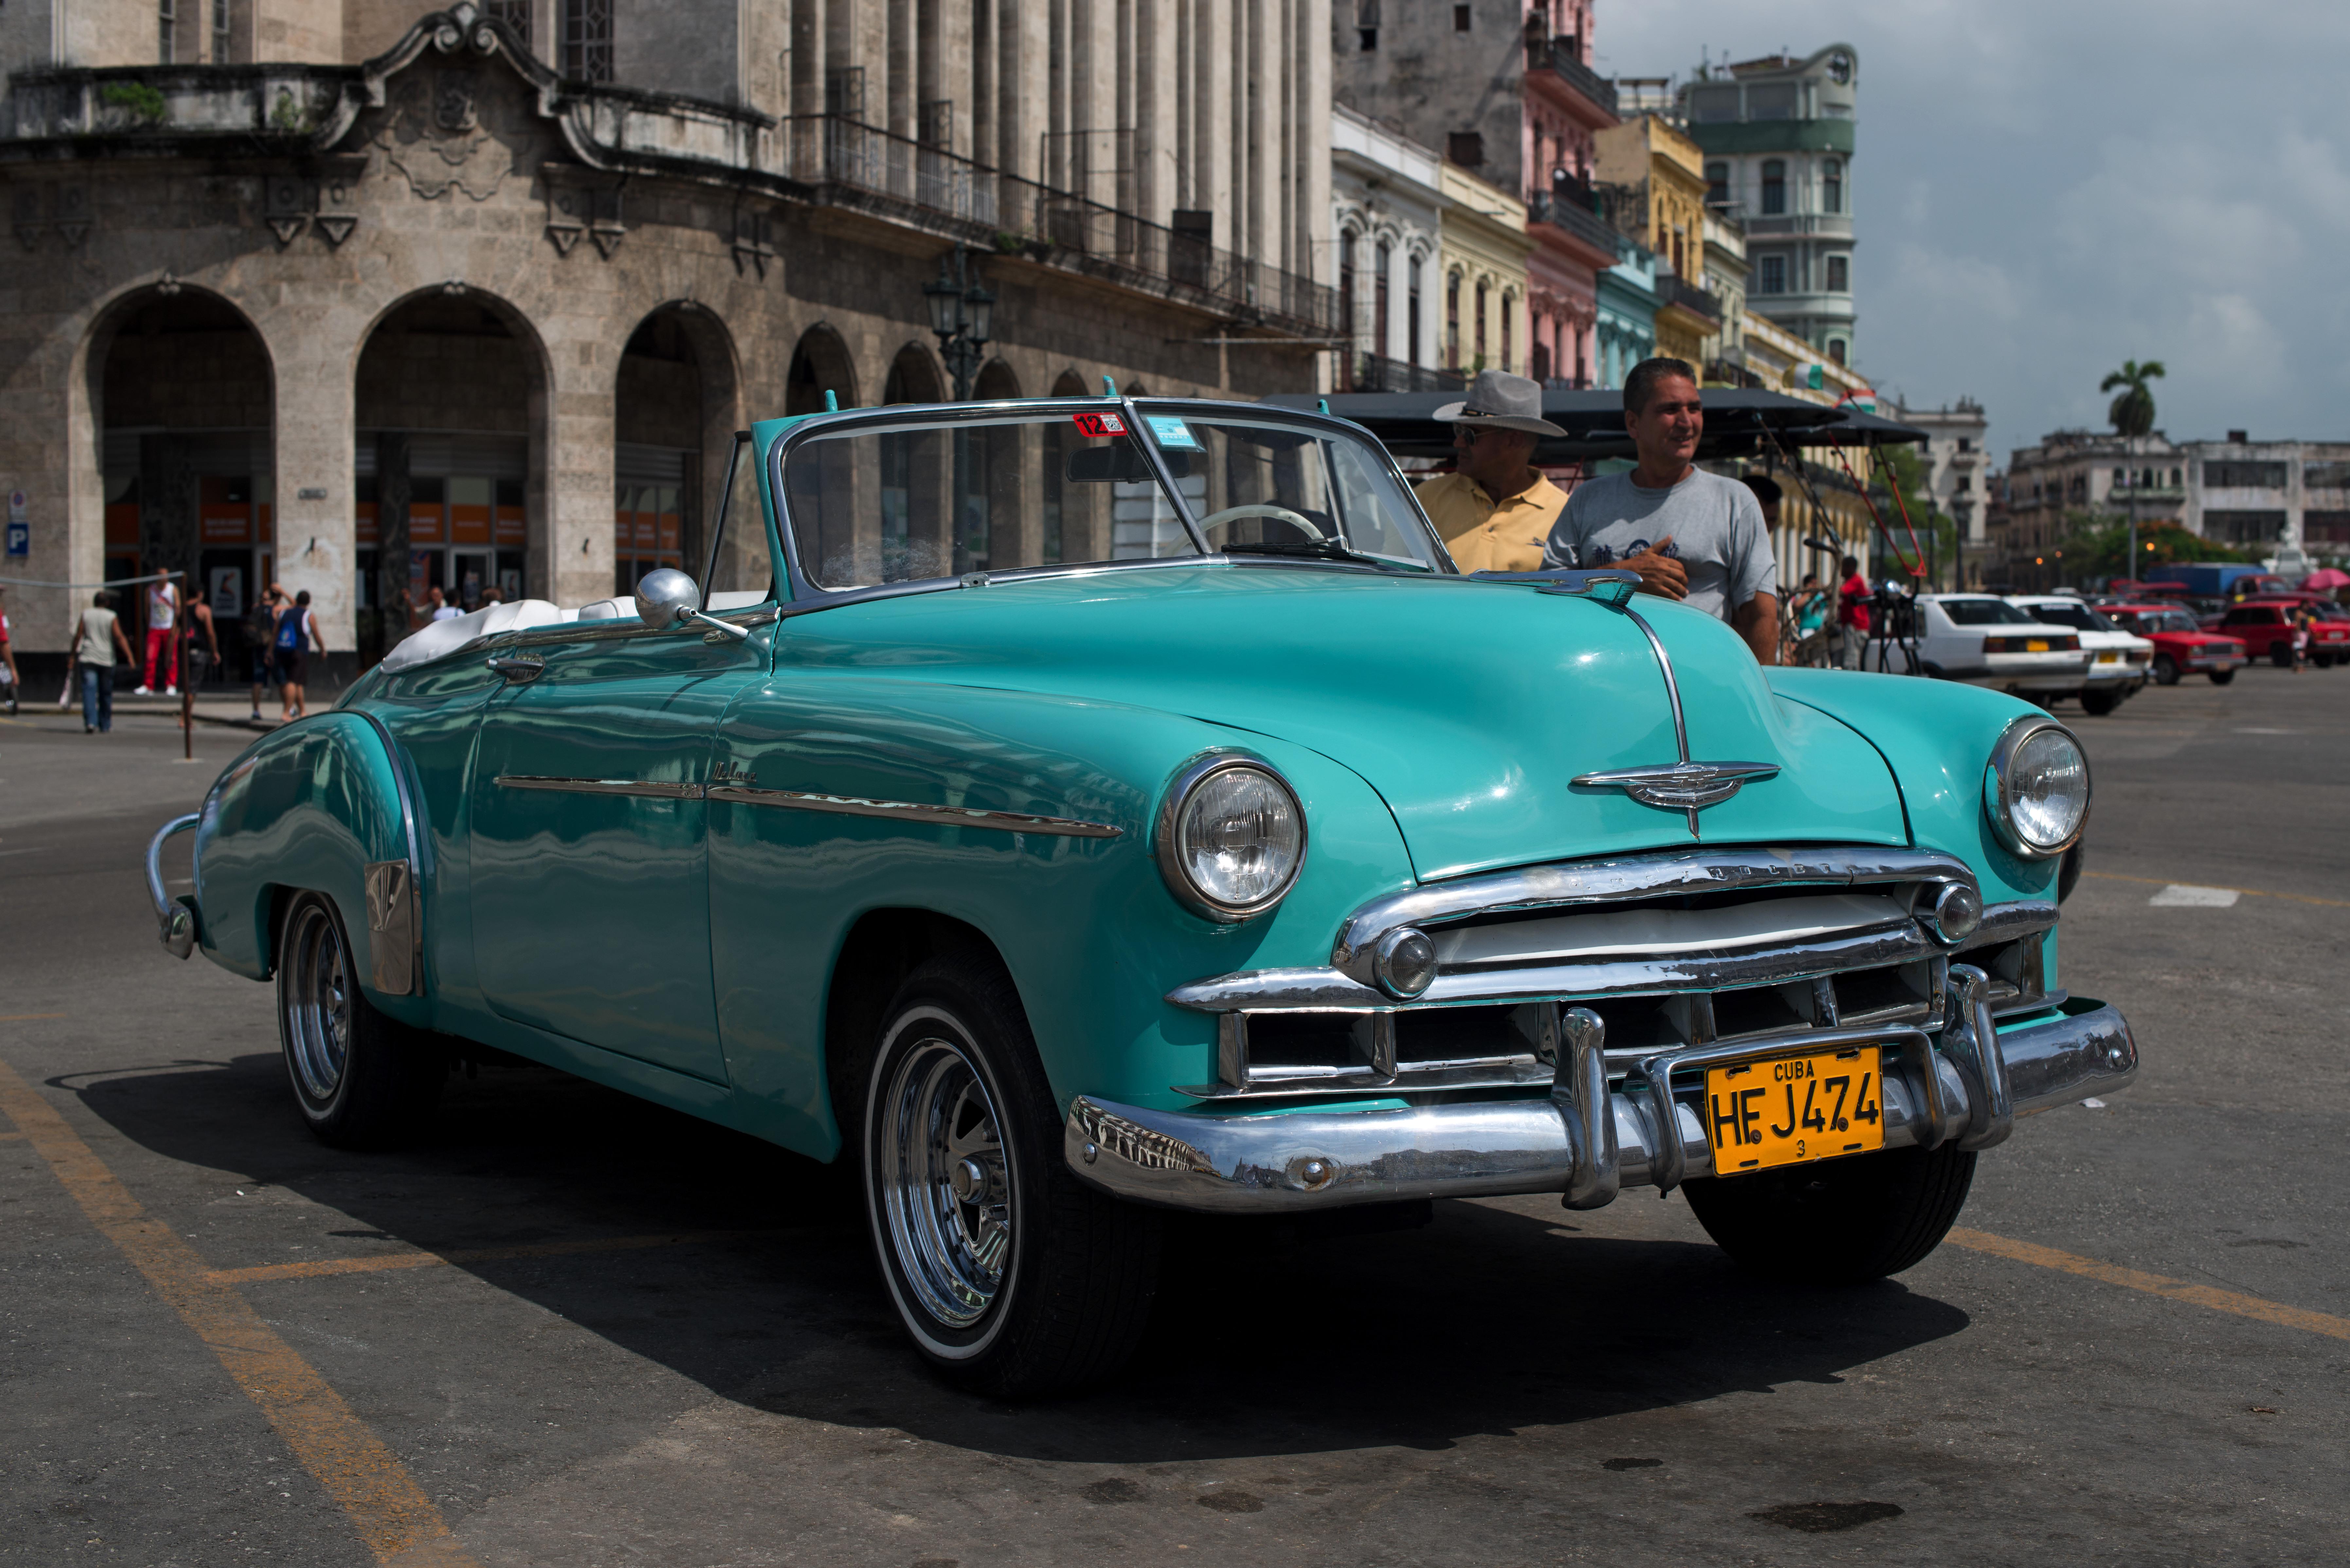 Habana_Chrysler_4_2803Habana_Chrysler_4low